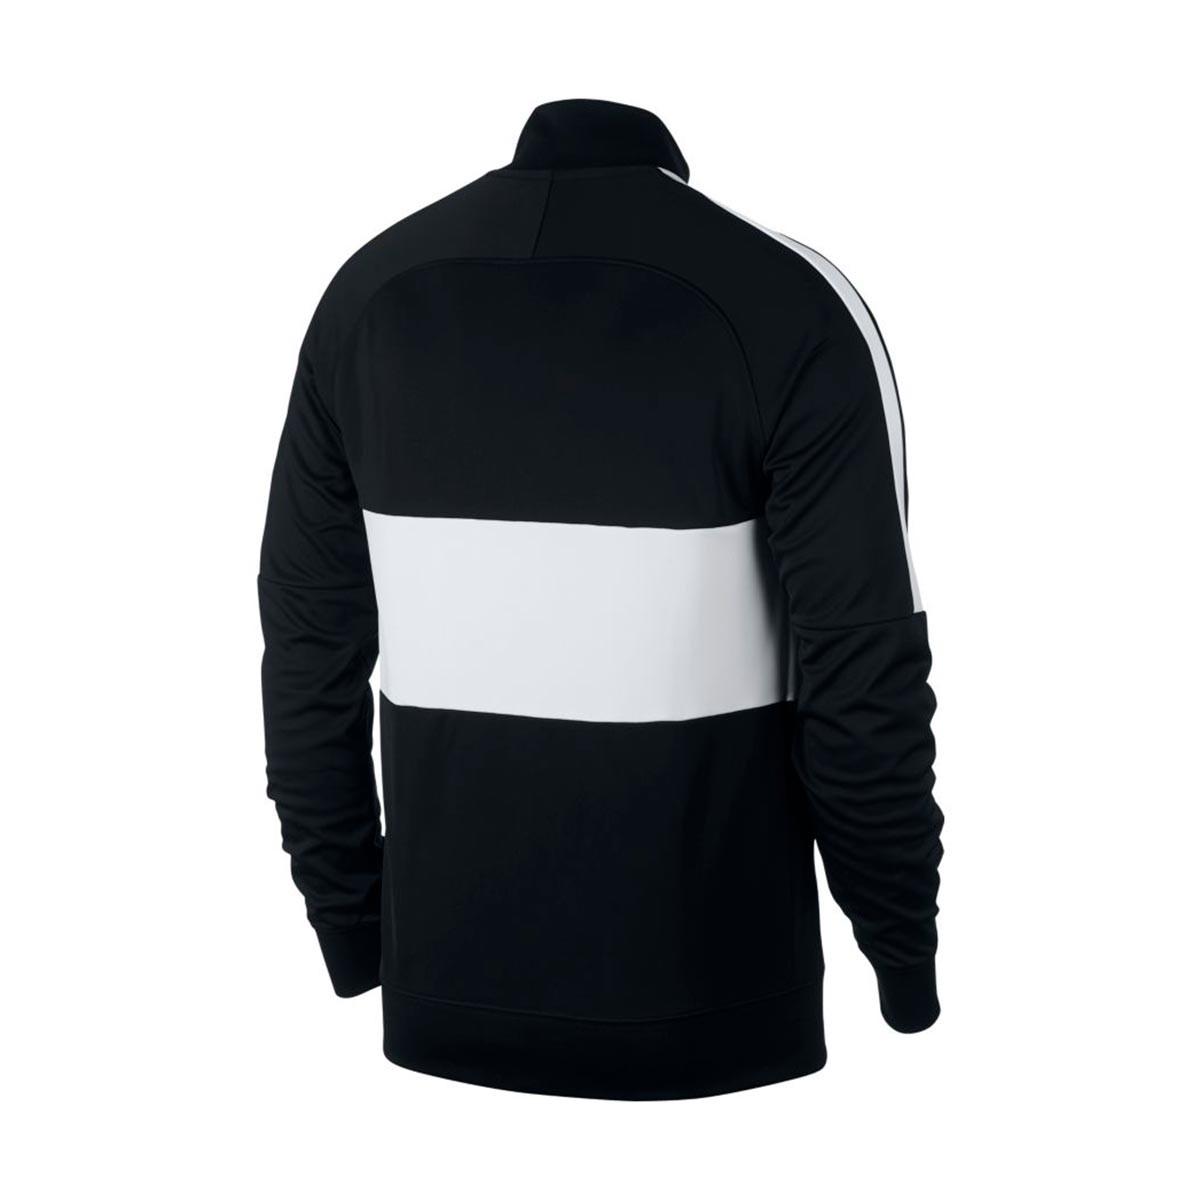 1d64b01e7 Jacket Nike Dri-FIT Academy Black-White - Football store Fútbol Emotion